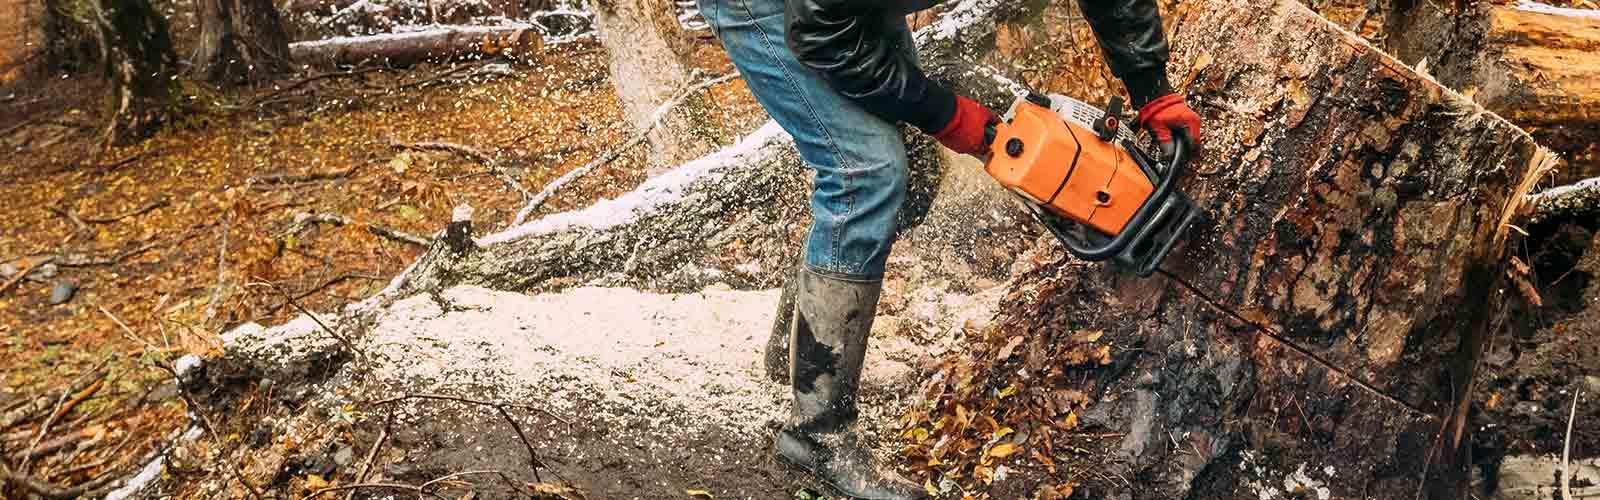 Baumpflege Rohrbeck - Baumfällung mit Kettensäge